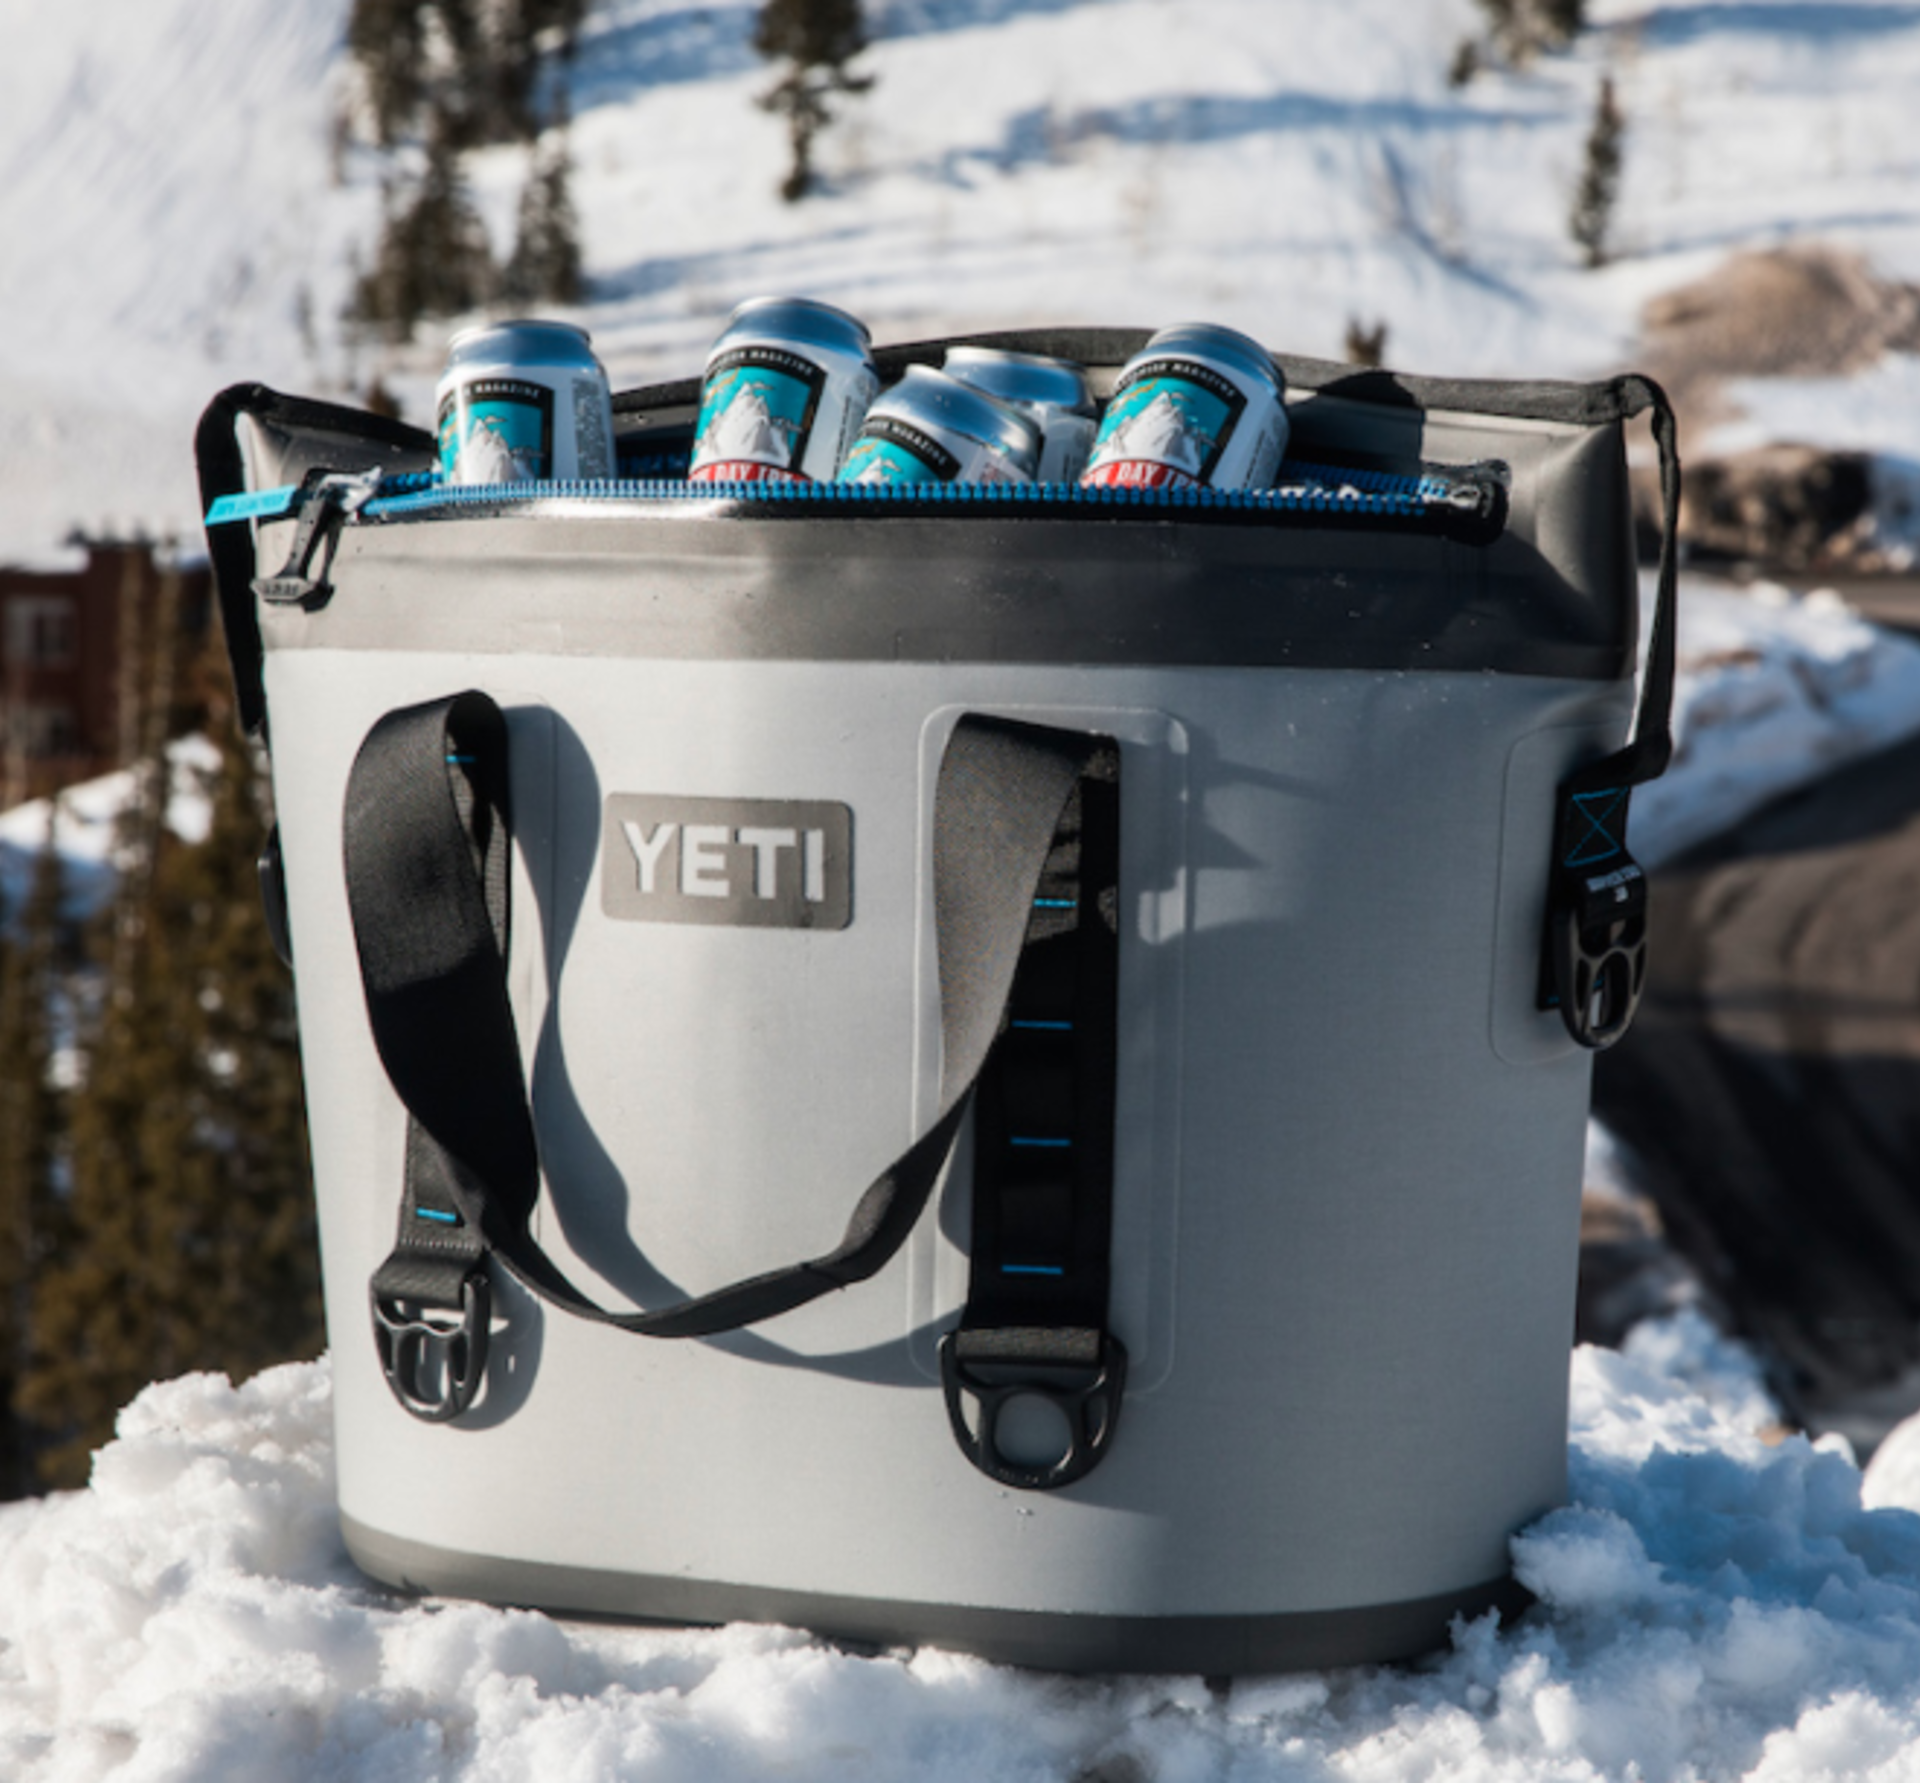 Testimonial Contest! Win a Yeti Cooler